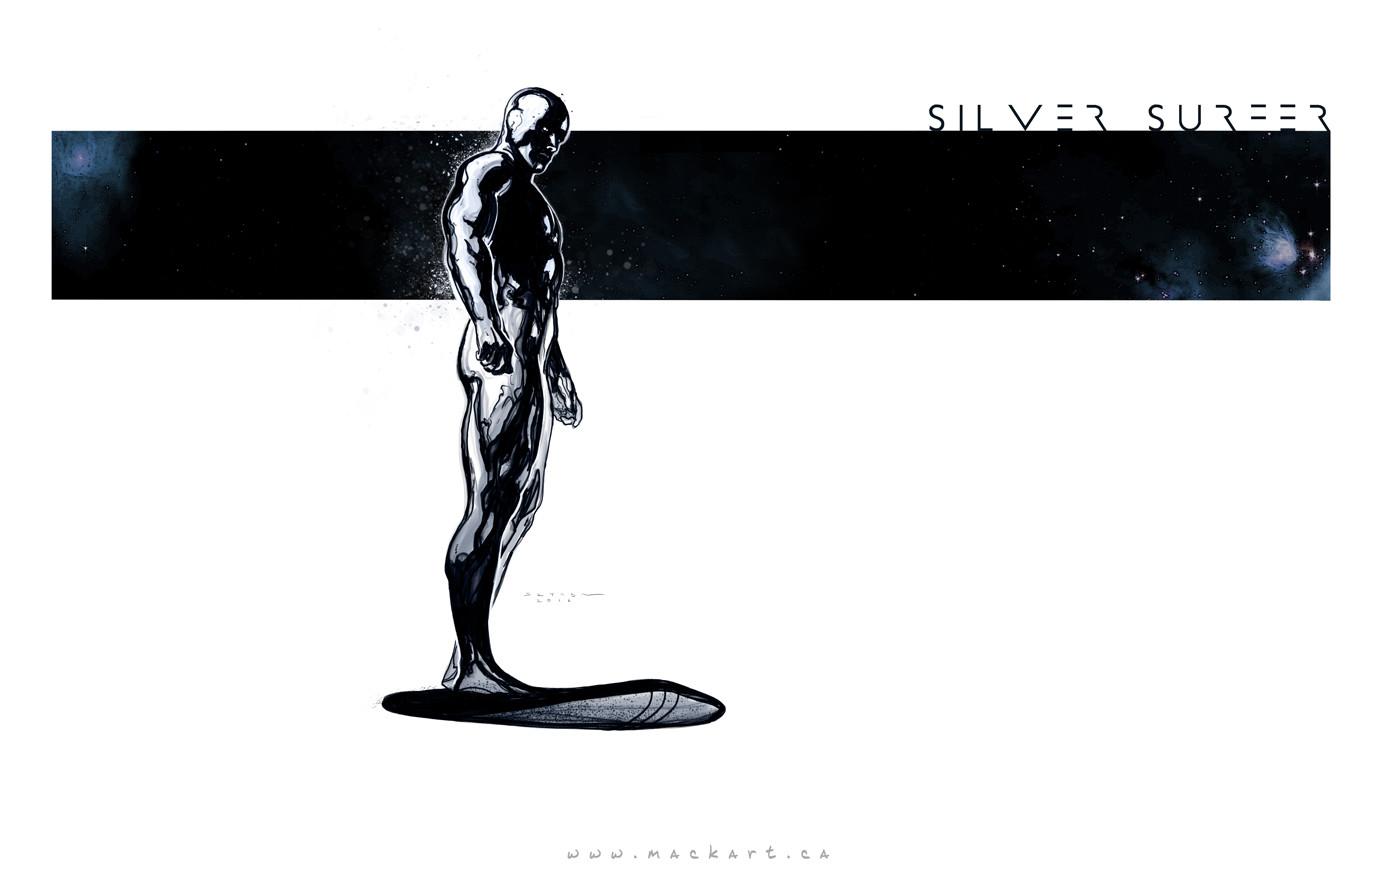 Mack sztaba silver surfer sketch